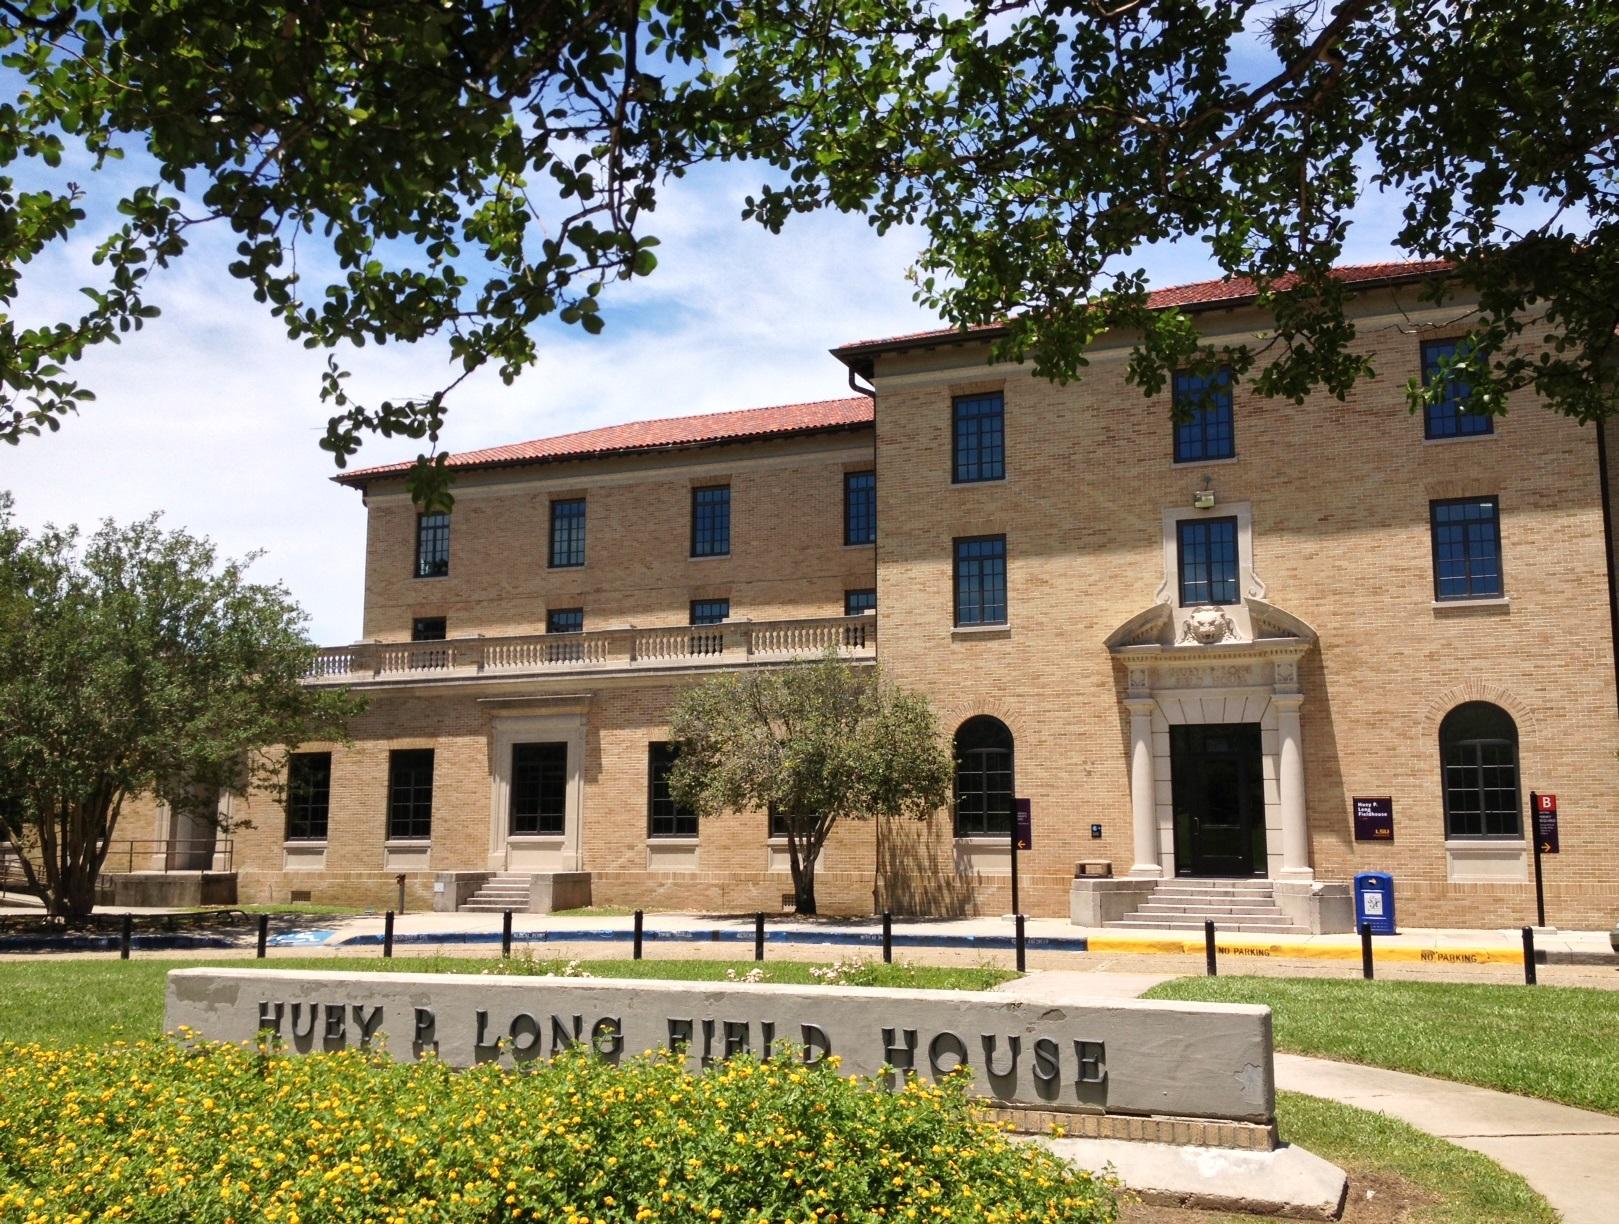 LSU Huey Long Field House